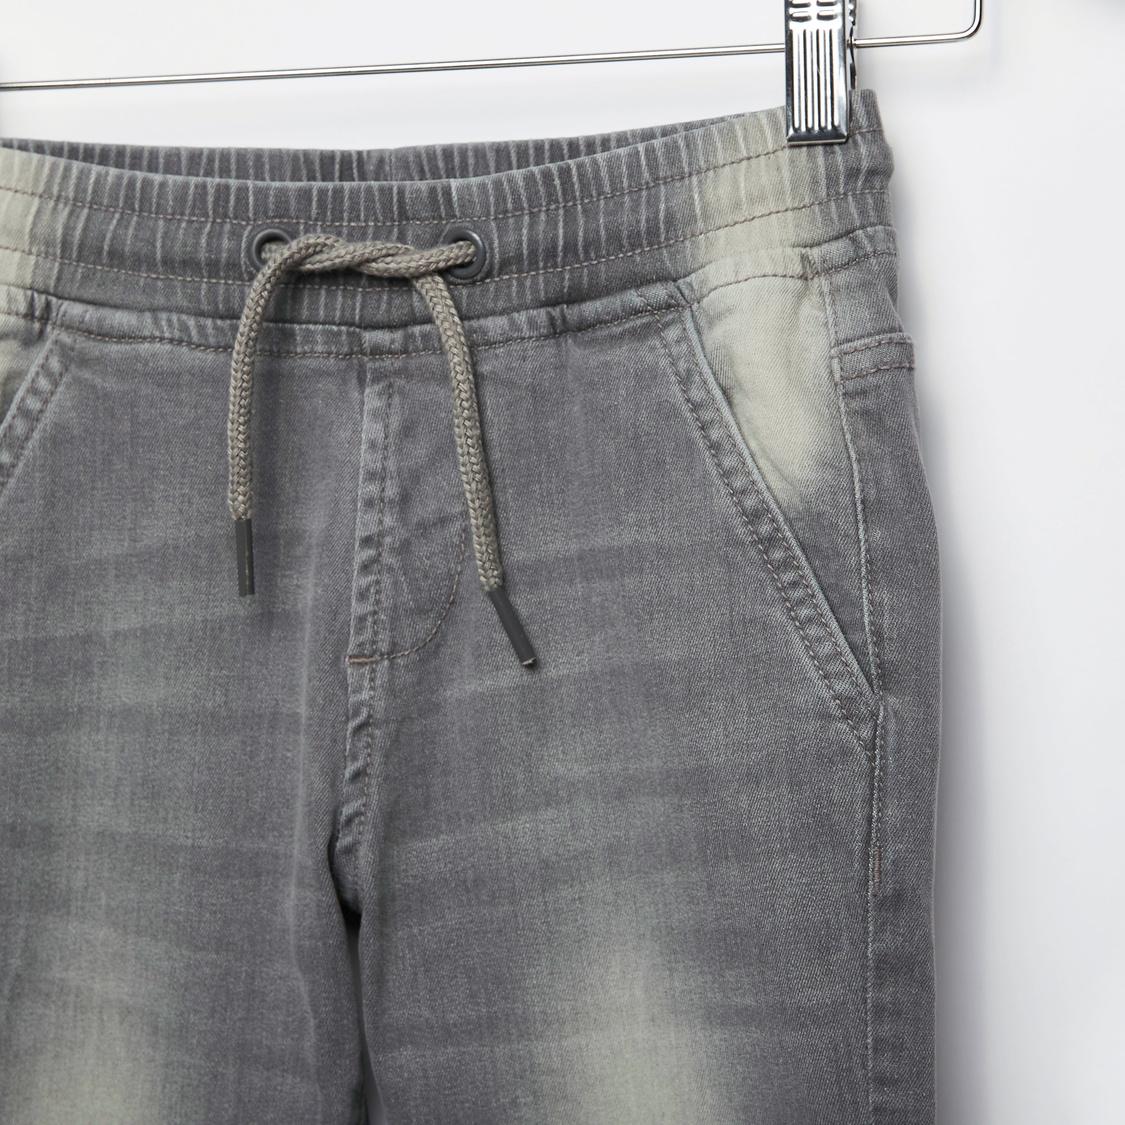 Solid Denim Jog Pants with Pockets and Drawstring